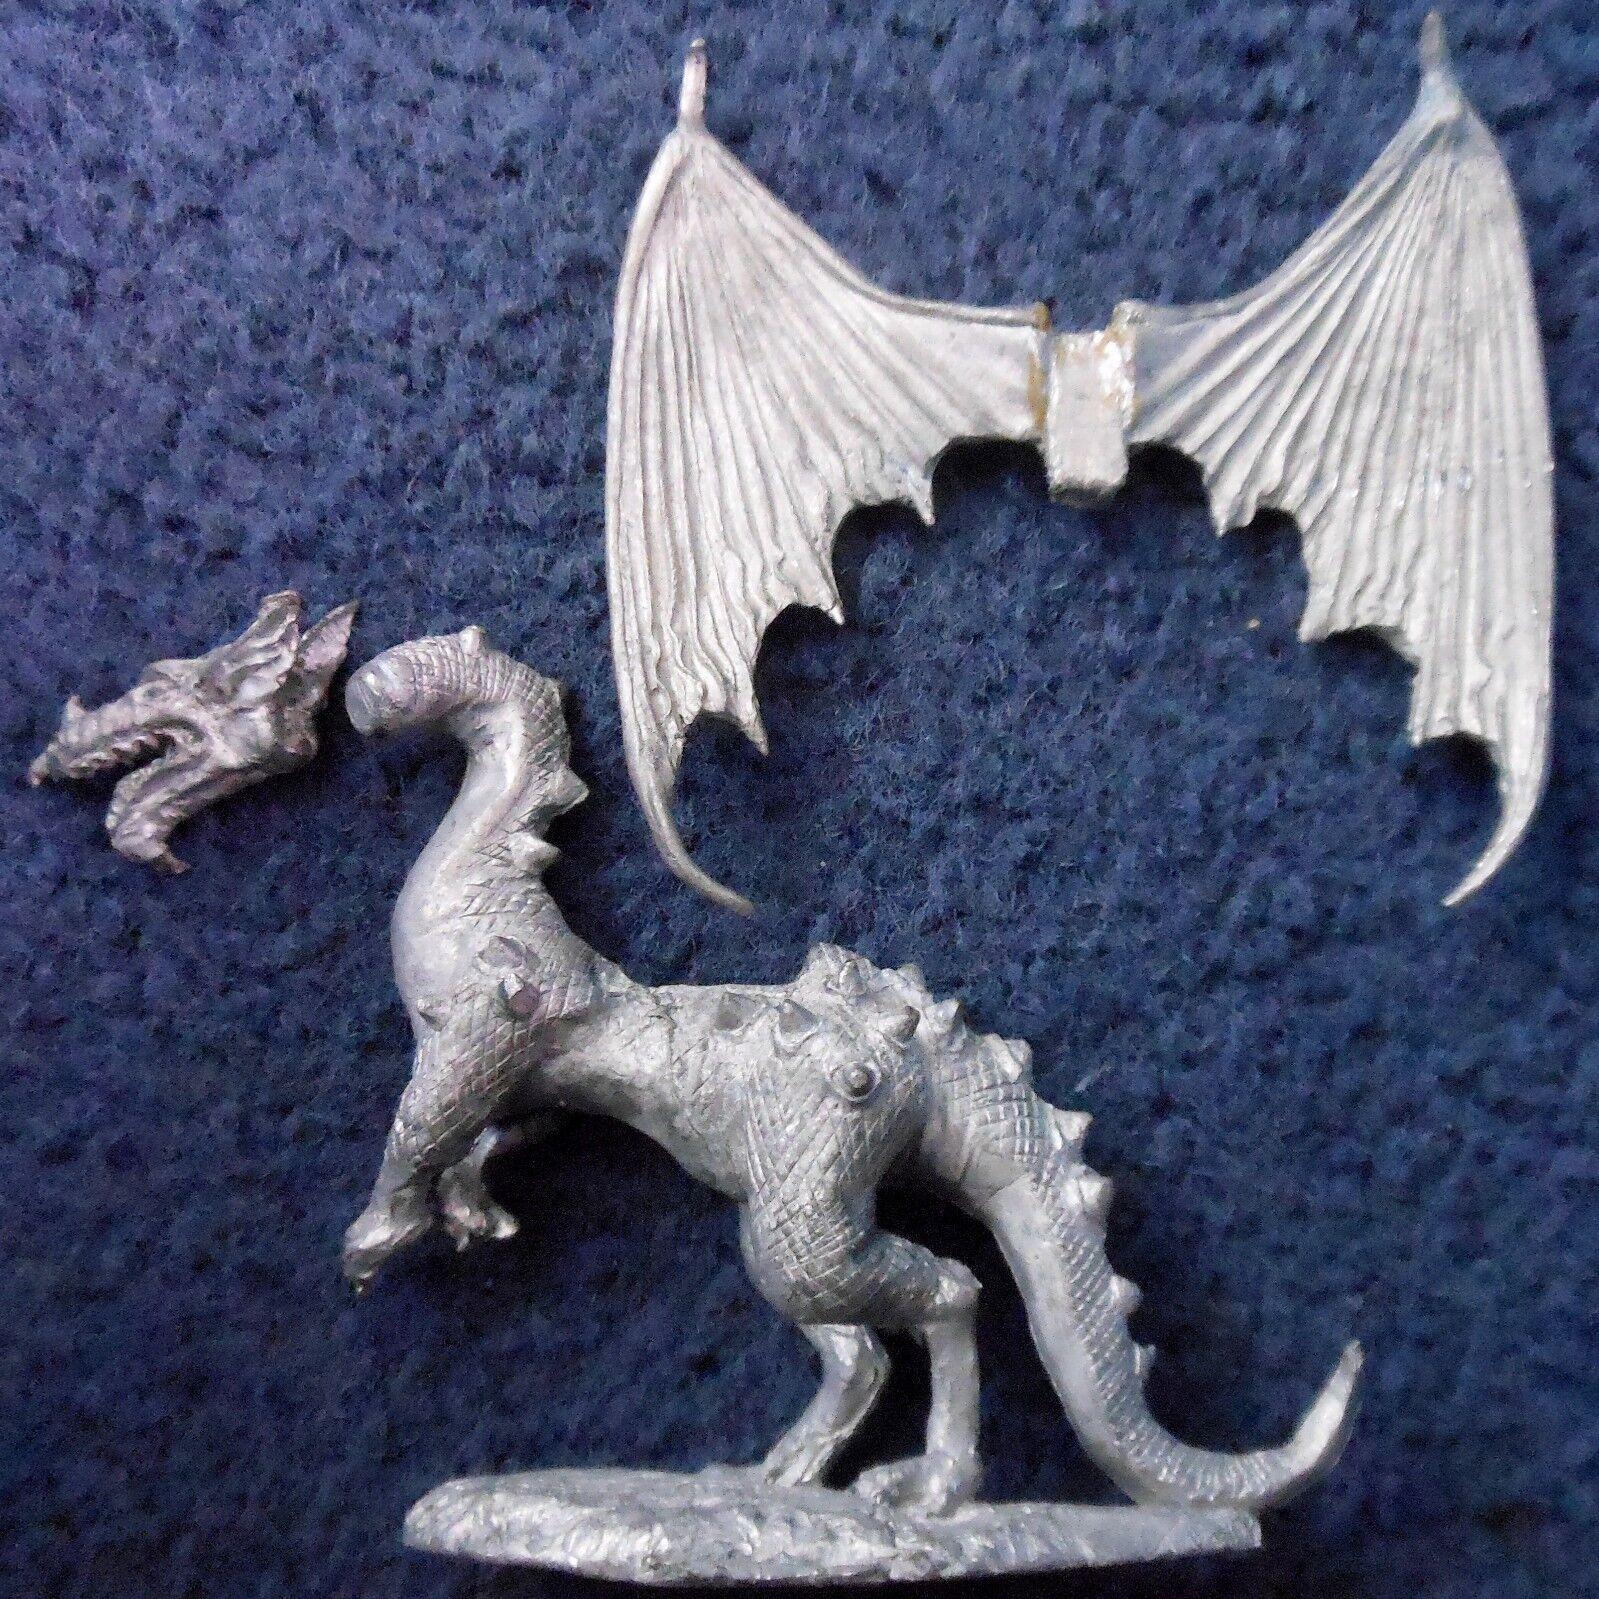 1983 C11 DRG4 gold H6 Dungeons & Dragons Citadel golden Fantasy Tribes Tribe D&D